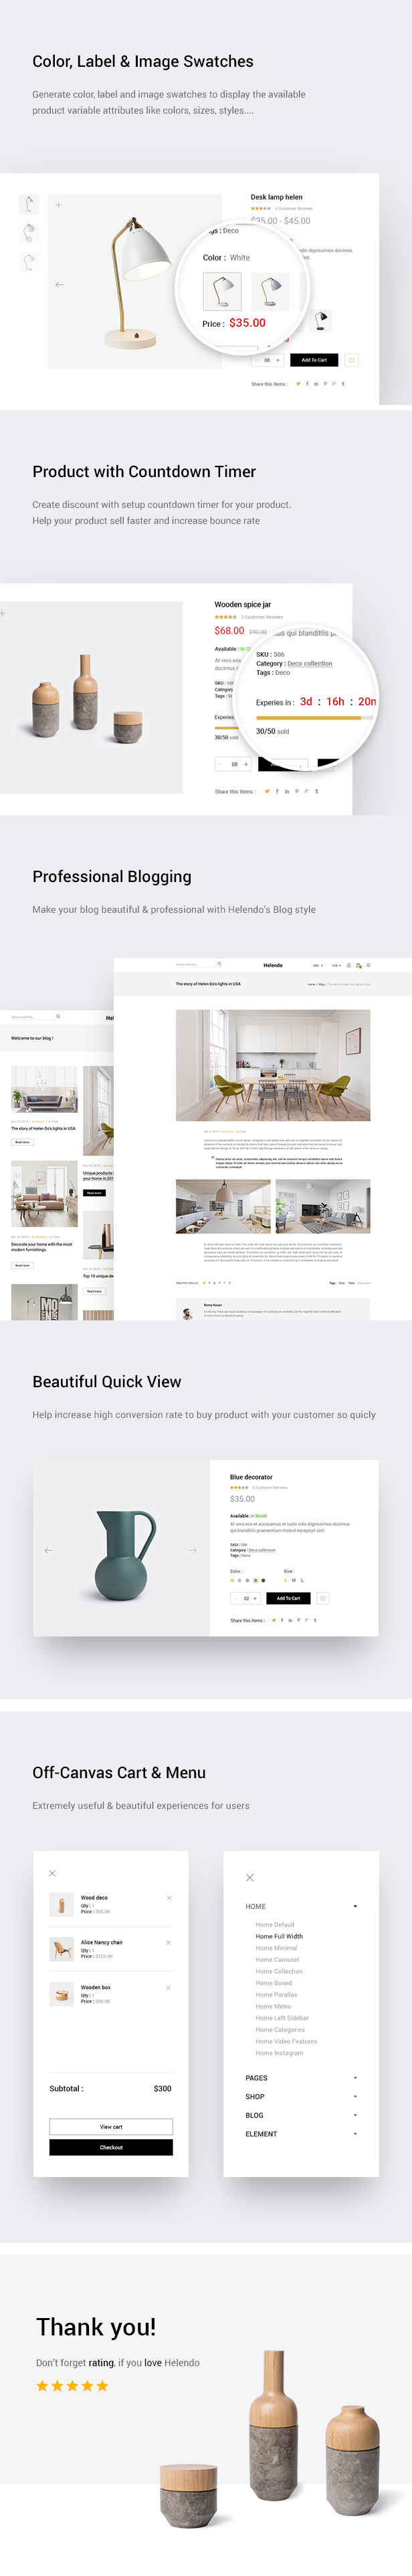 Helendo - Furniture eCommerce HTML Template - 2